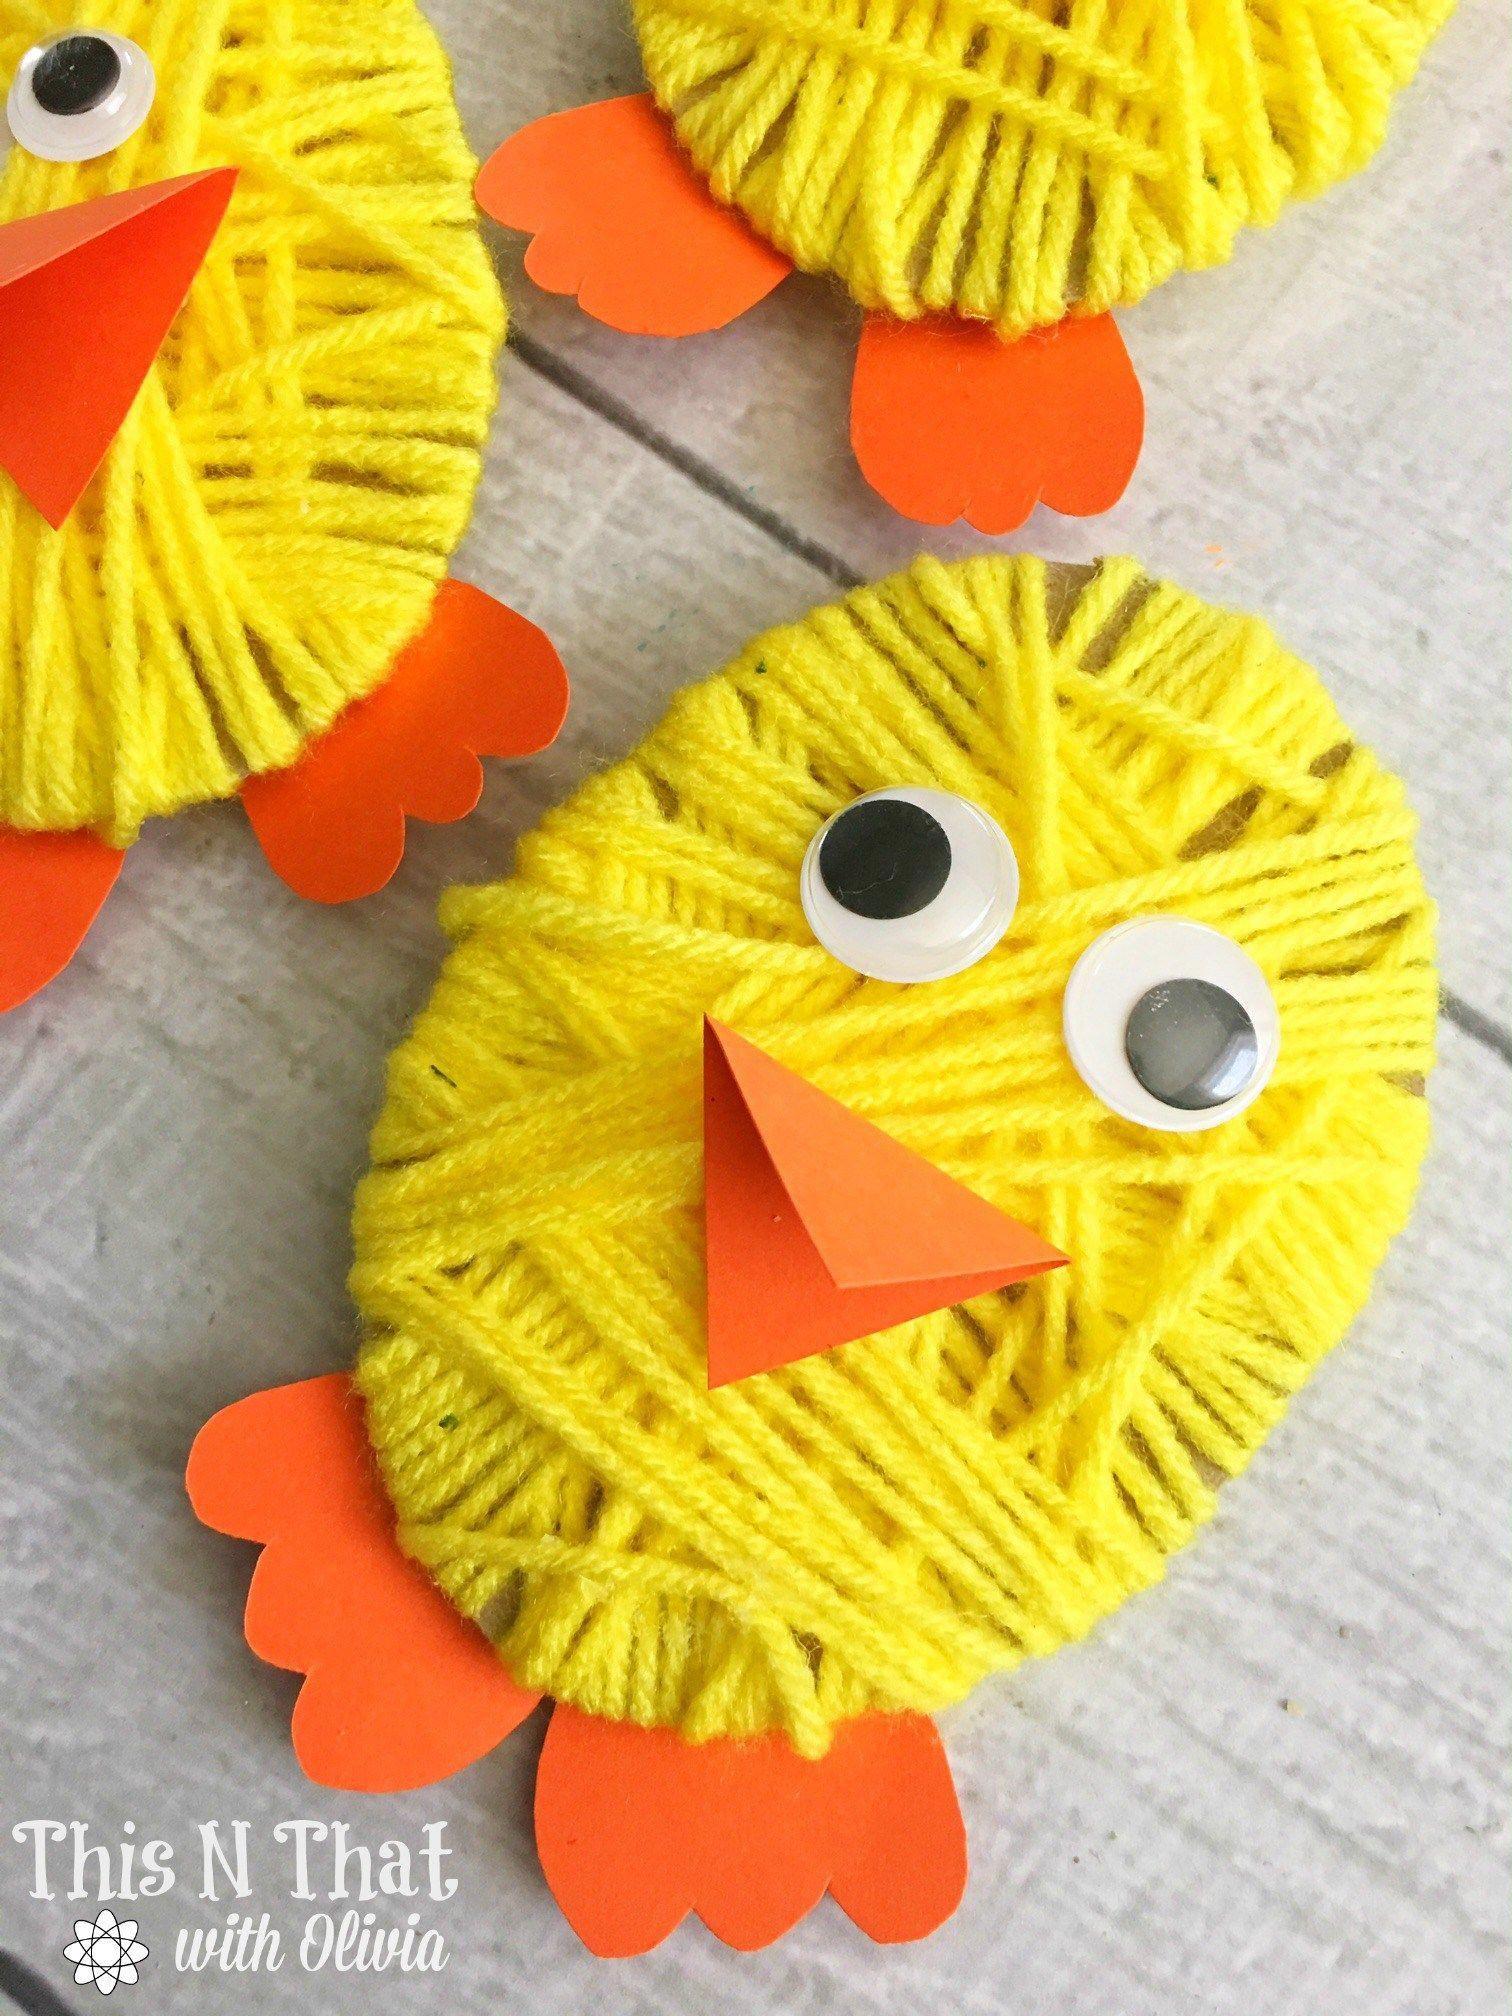 Chick Yarn Craft Diy Crafts Ideas Pinterest Easter Easter